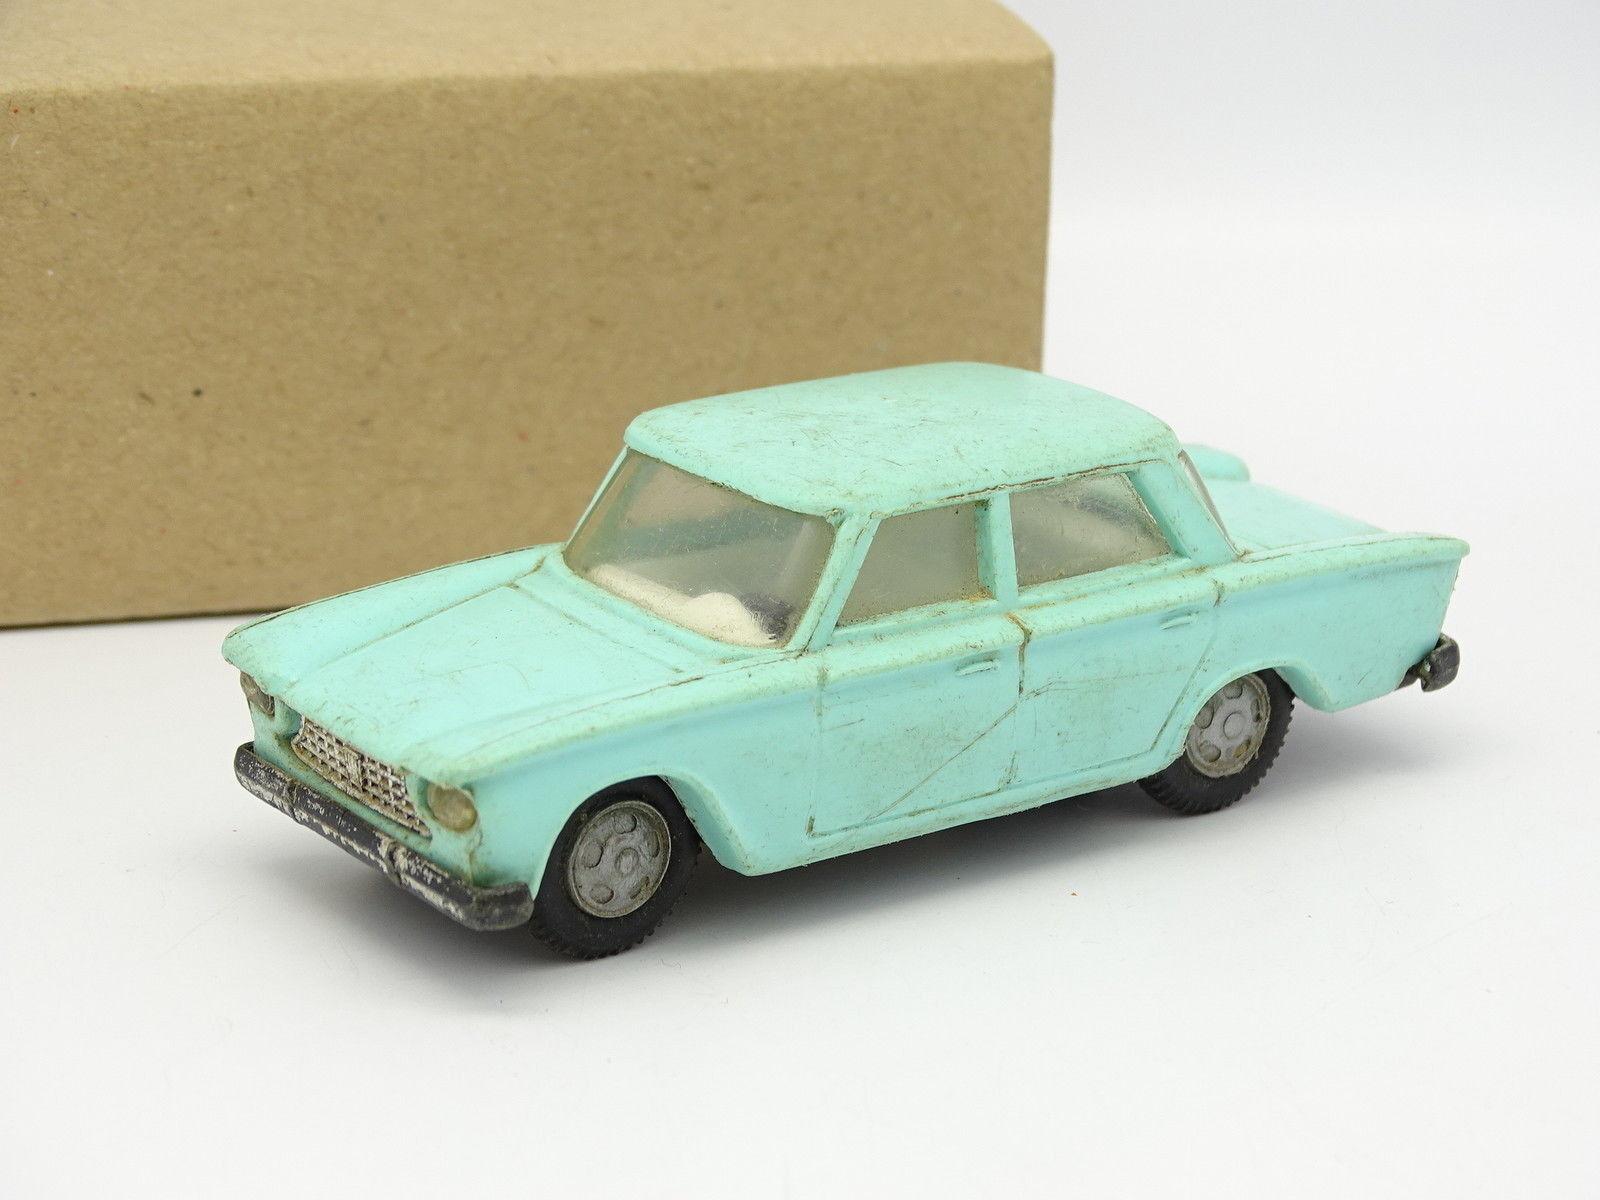 Politoys Plastique SB SB SB 1 43 - Fiat 1300 verdee 02be31